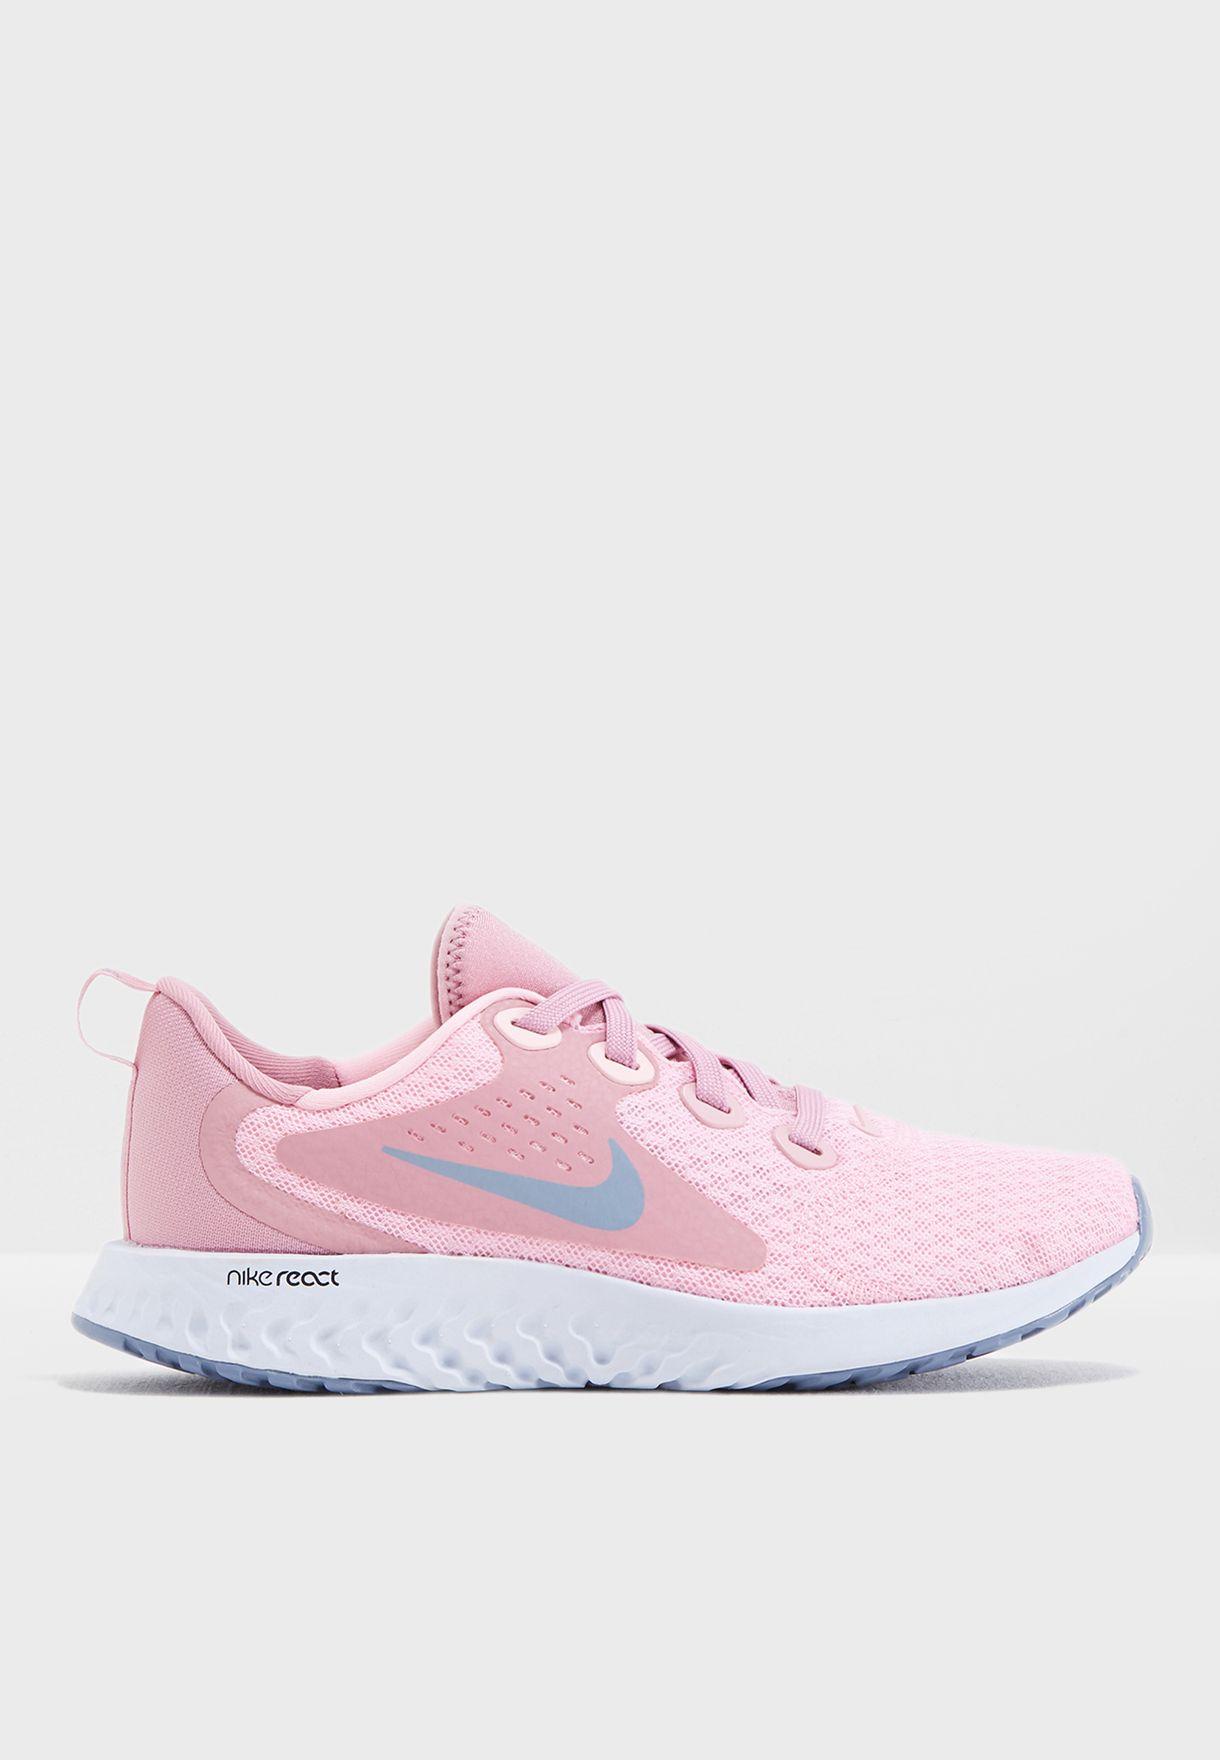 a1fe37d60897 Shop Nike pink Youth Rebel React AH9437-600 for Kids in UAE ...